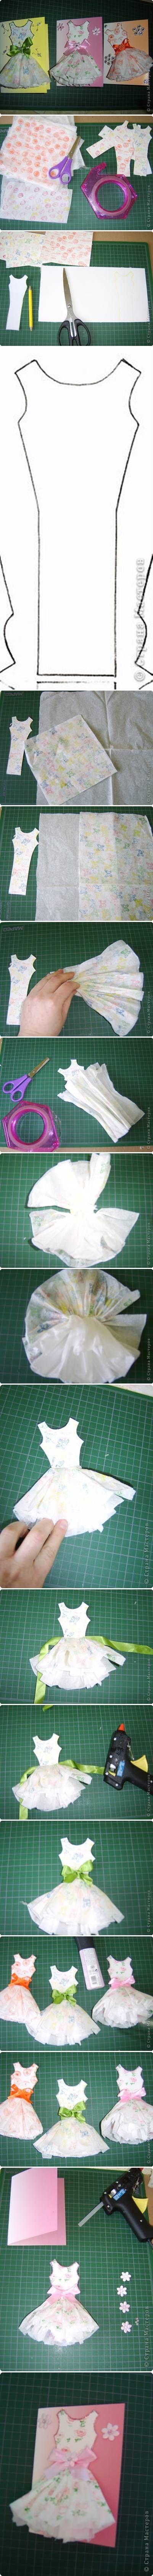 DIY Paper Dress Card Topper DIY Paper Dress Card Topper